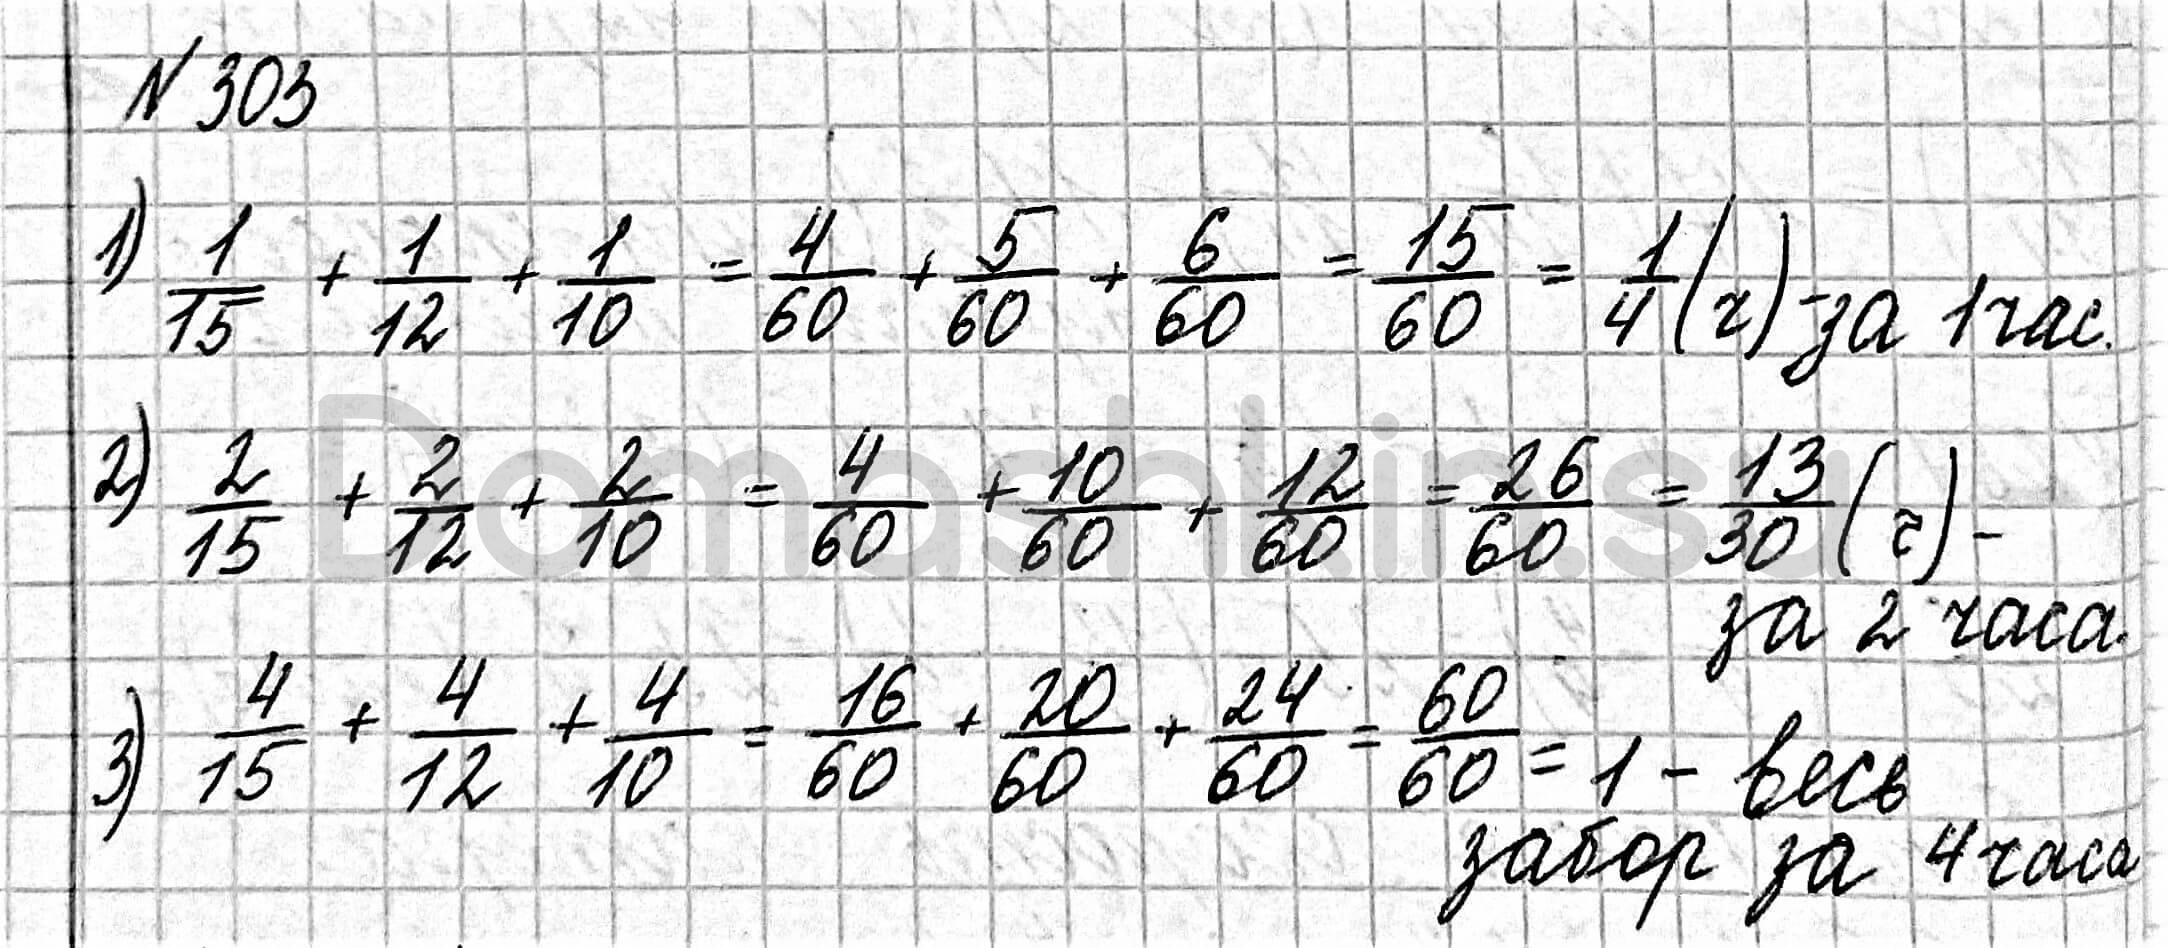 Математика 6 класс учебник Мерзляк номер 303 решение